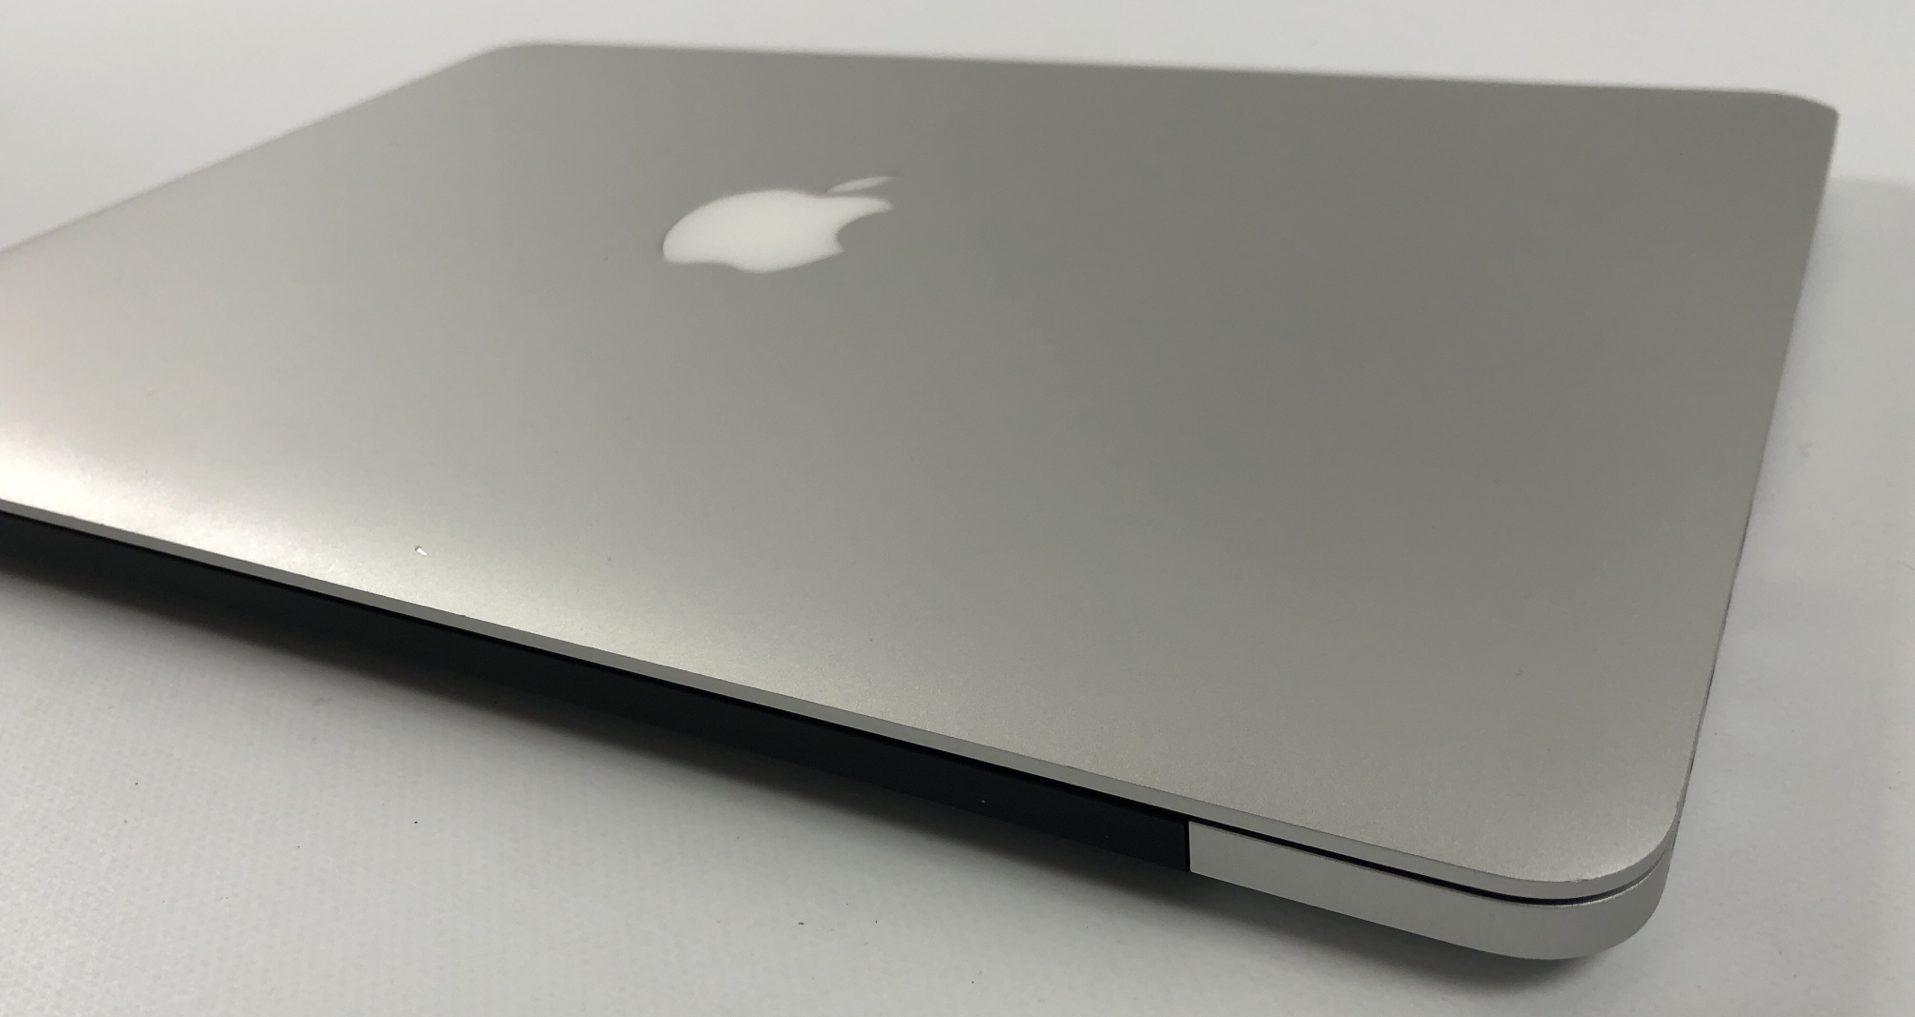 "MacBook Pro Retina 13"" Early 2015 (Intel Core i7 3.1 GHz 16 GB RAM 512 GB SSD), Intel Core i7 3.1 GHz, 16 GB RAM, 512 GB SSD, Kuva 4"